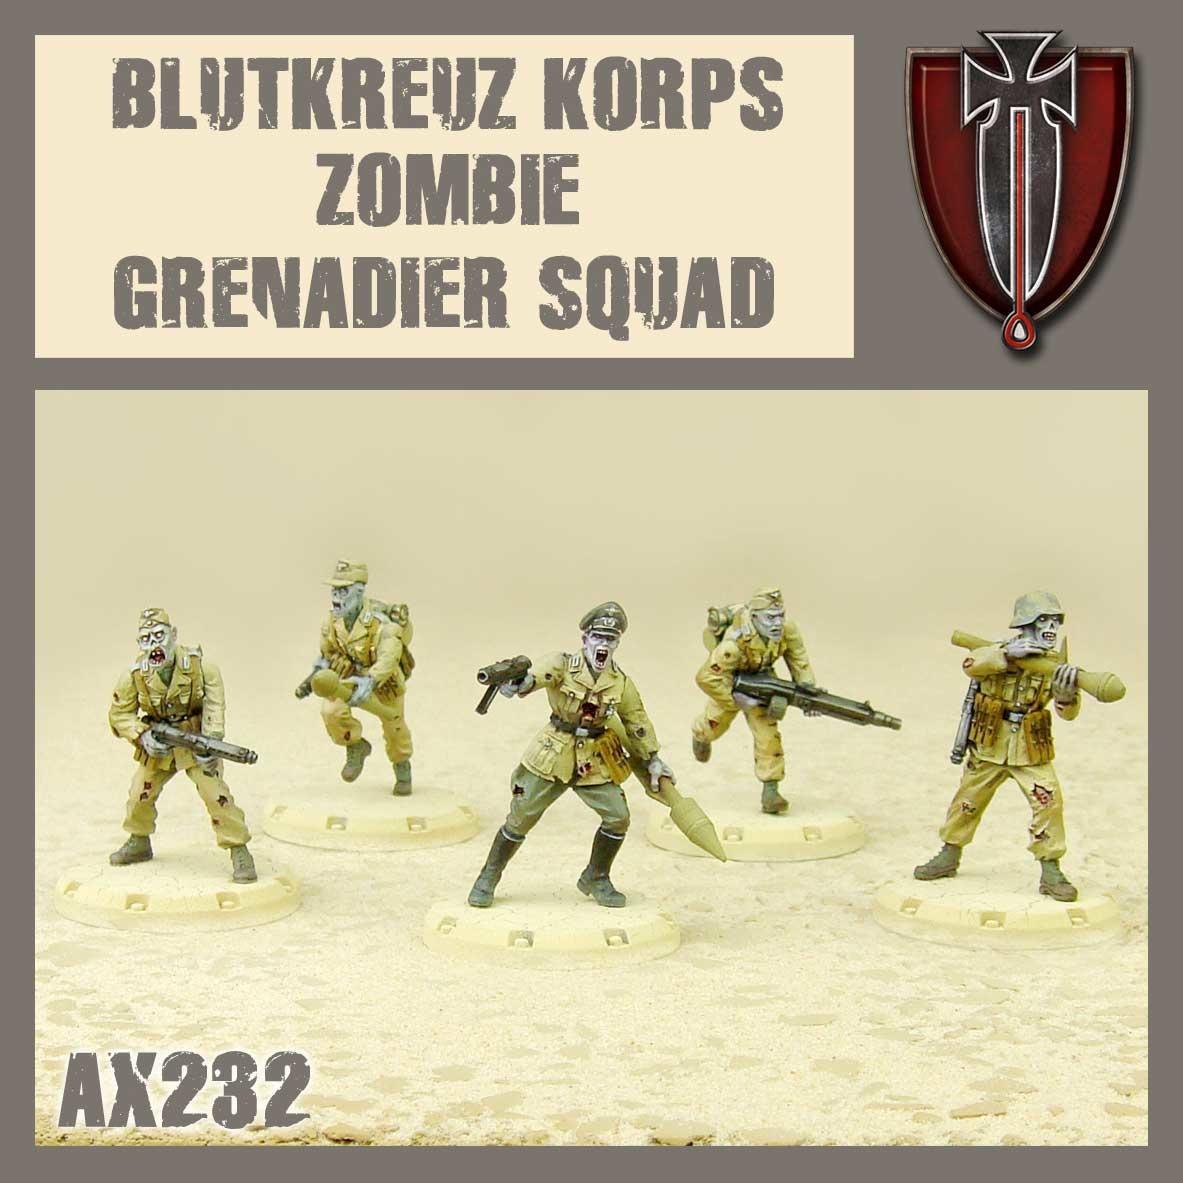 DUST USA DUST DROP-SHIP: Blutkreuz Korps Zombie Grenadier Squad